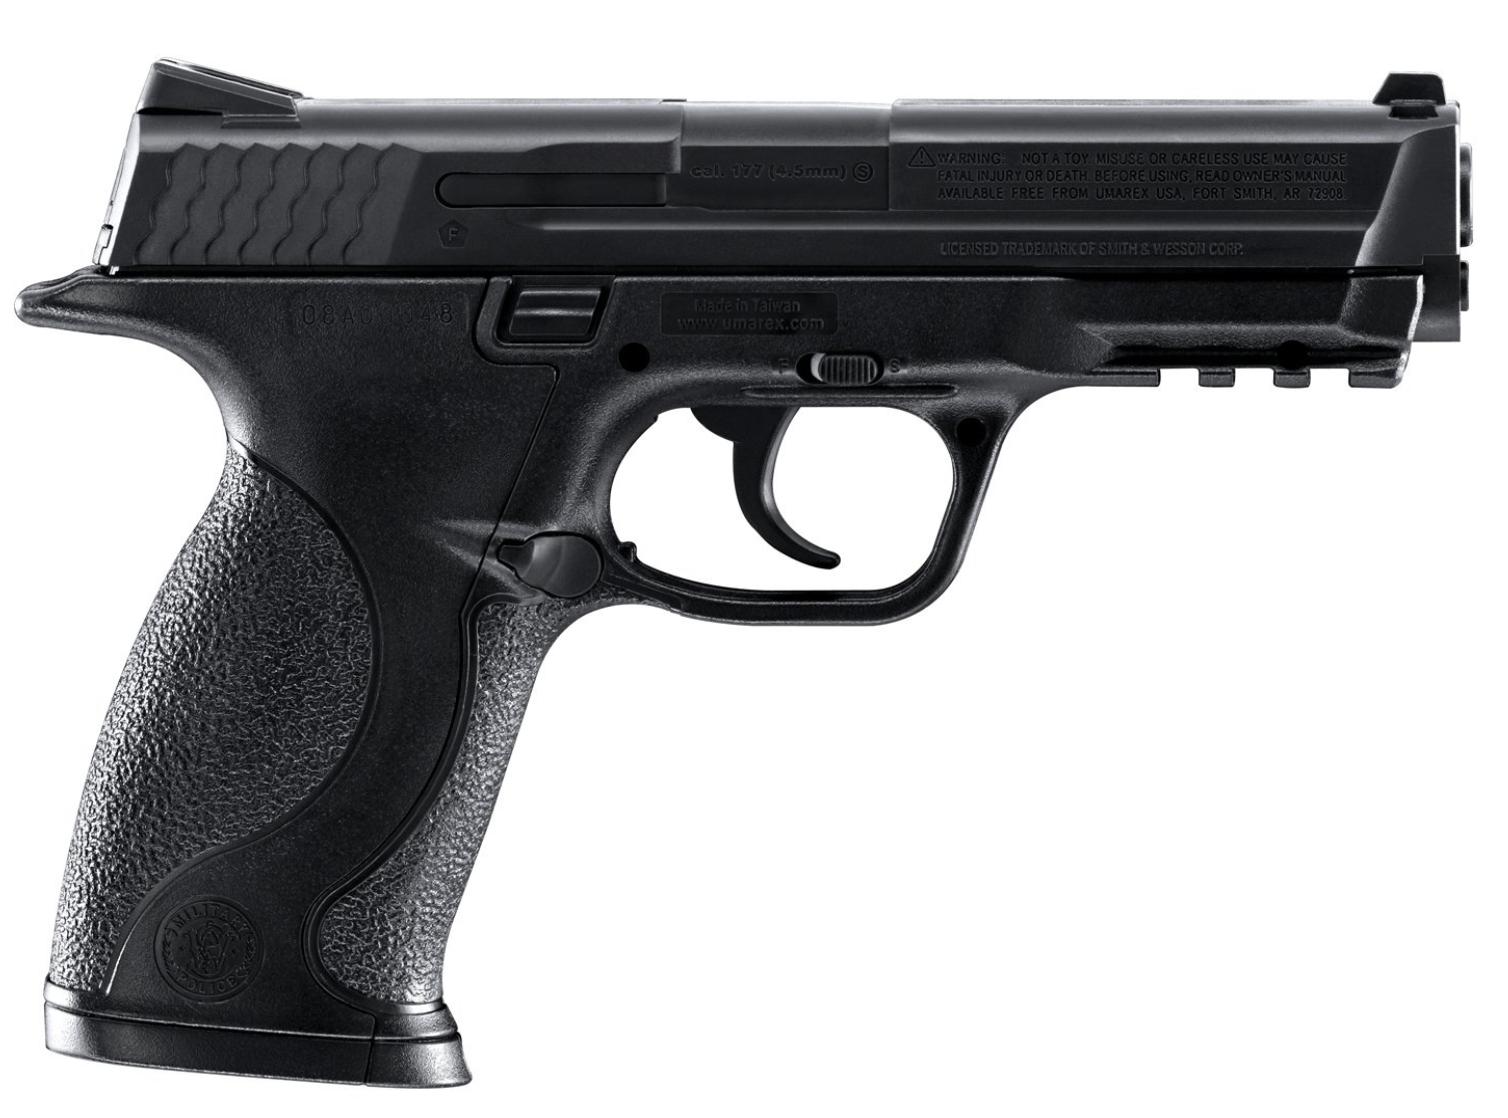 Smith & Wesson M&P Airgun Air Pistol Review - RifleZone com